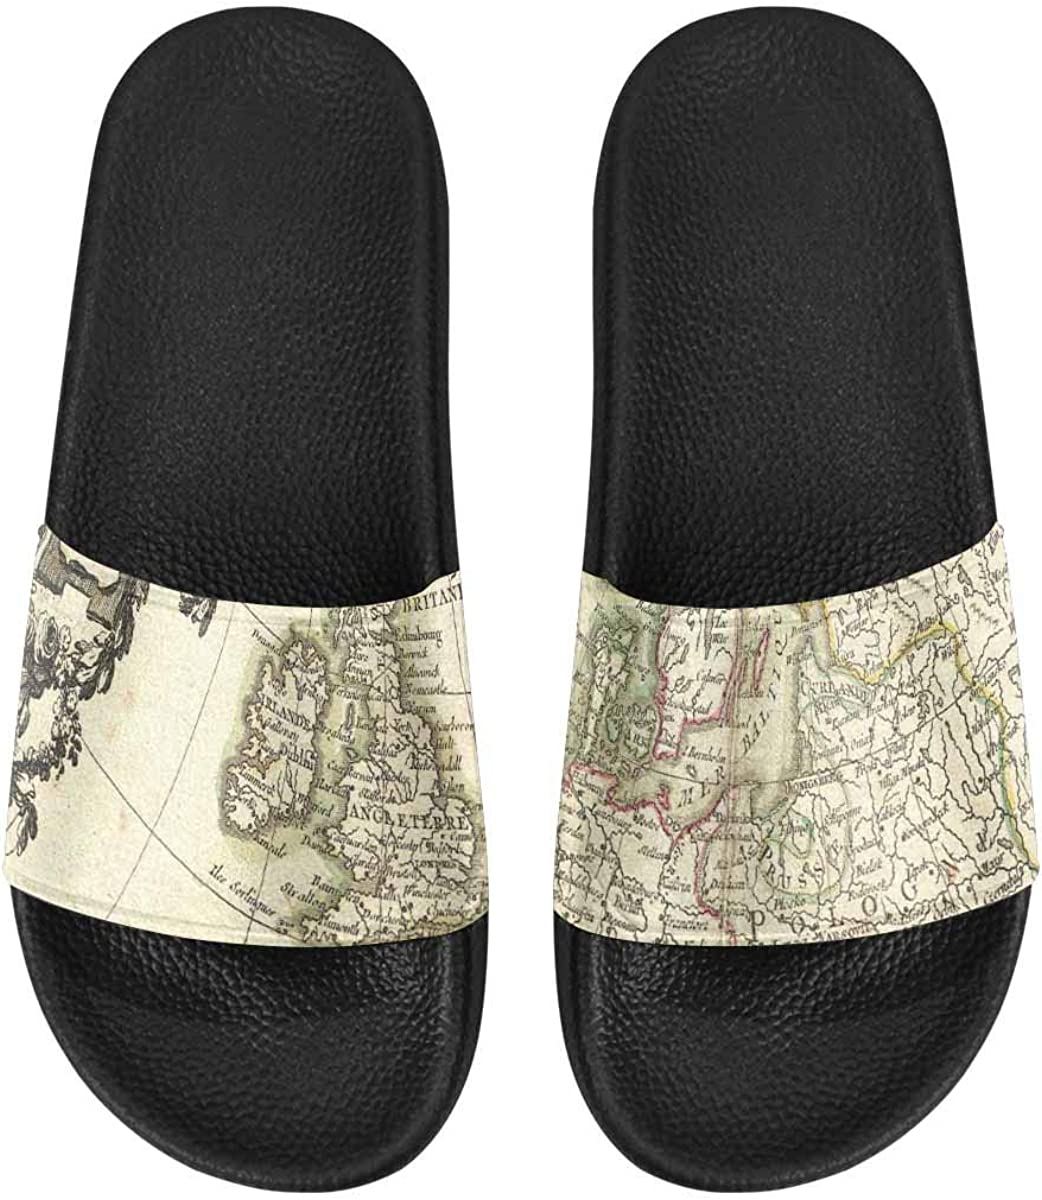 InterestPrint Outdoor Stylish Sandals Slides for Women Mandala Sketchy